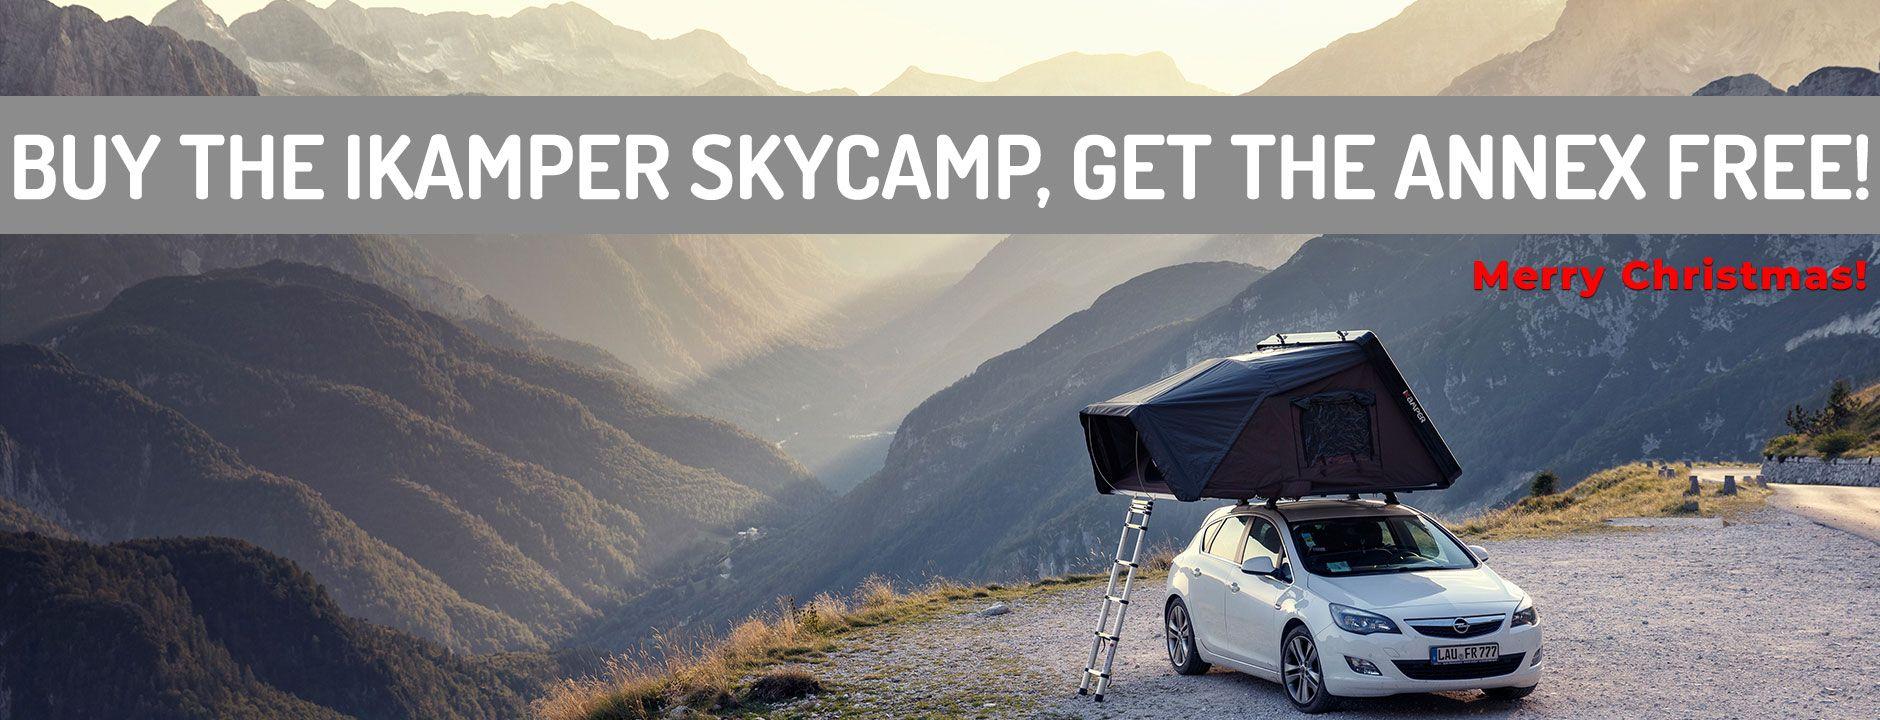 iKamper Skycamp Roof Top Tent Top tents, Roof top tent, Tent